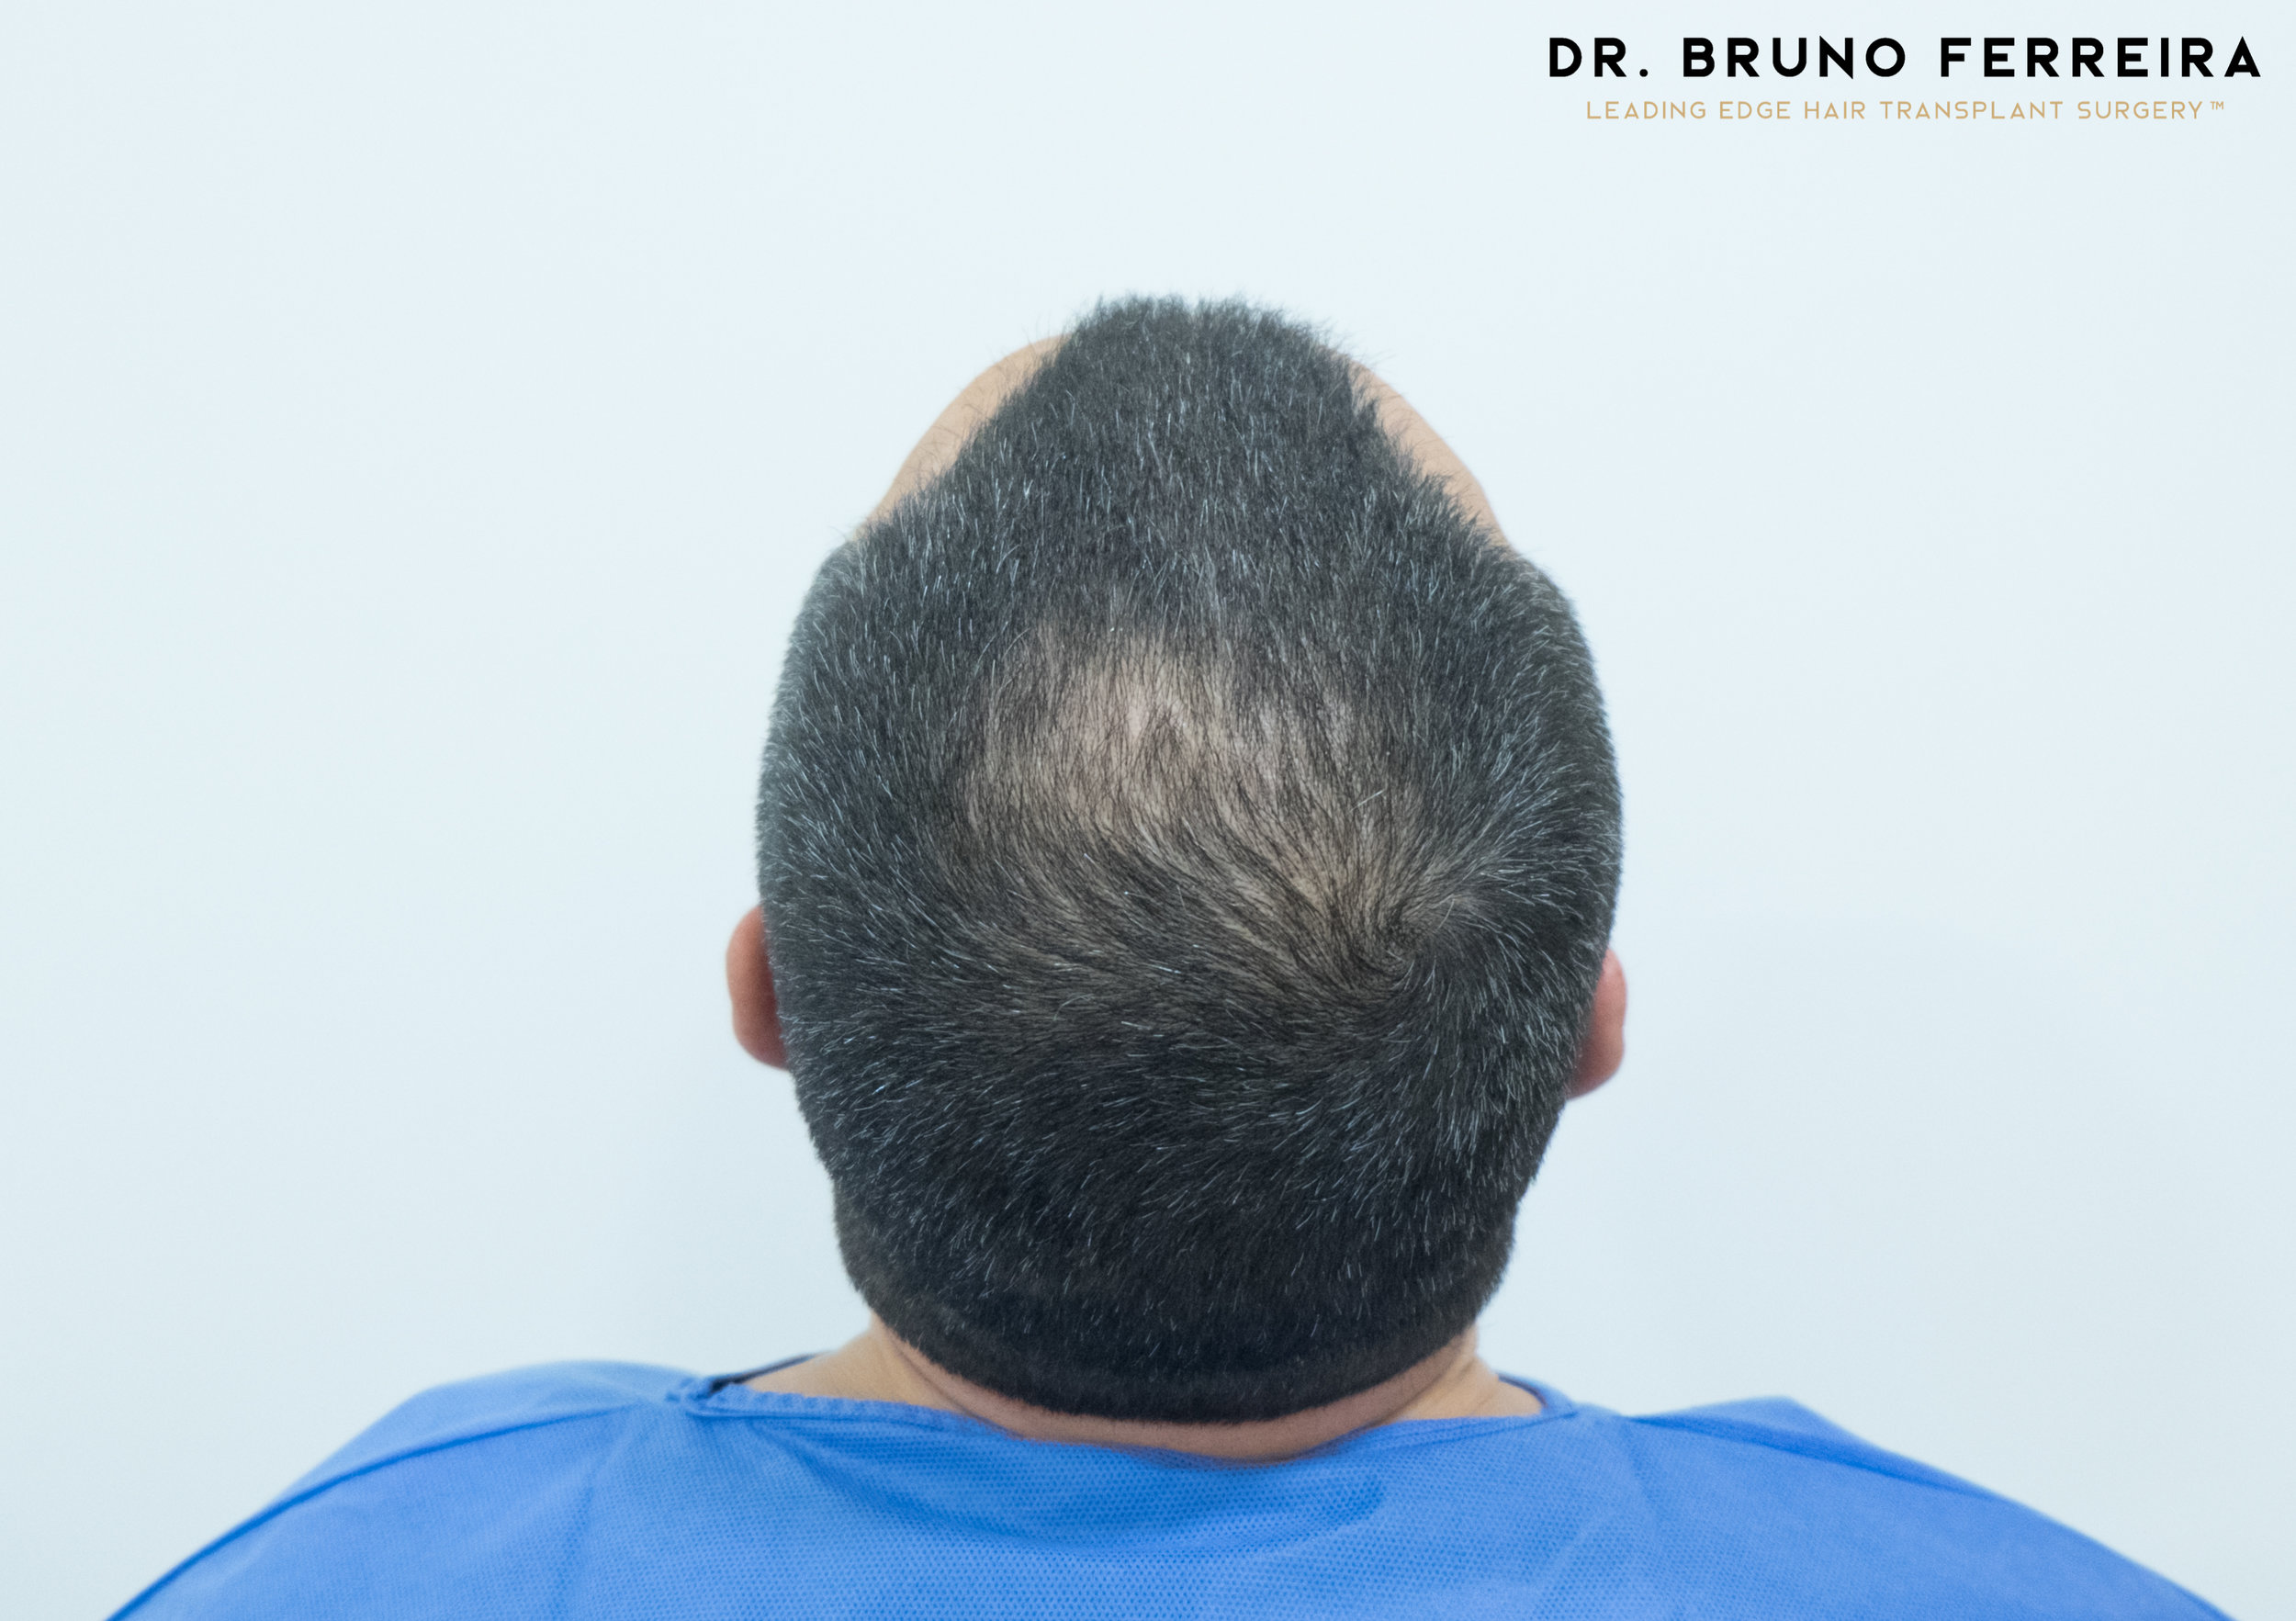 00004 DR. BRUNO FERREIRA (Case 1) - Before - 5.jpg